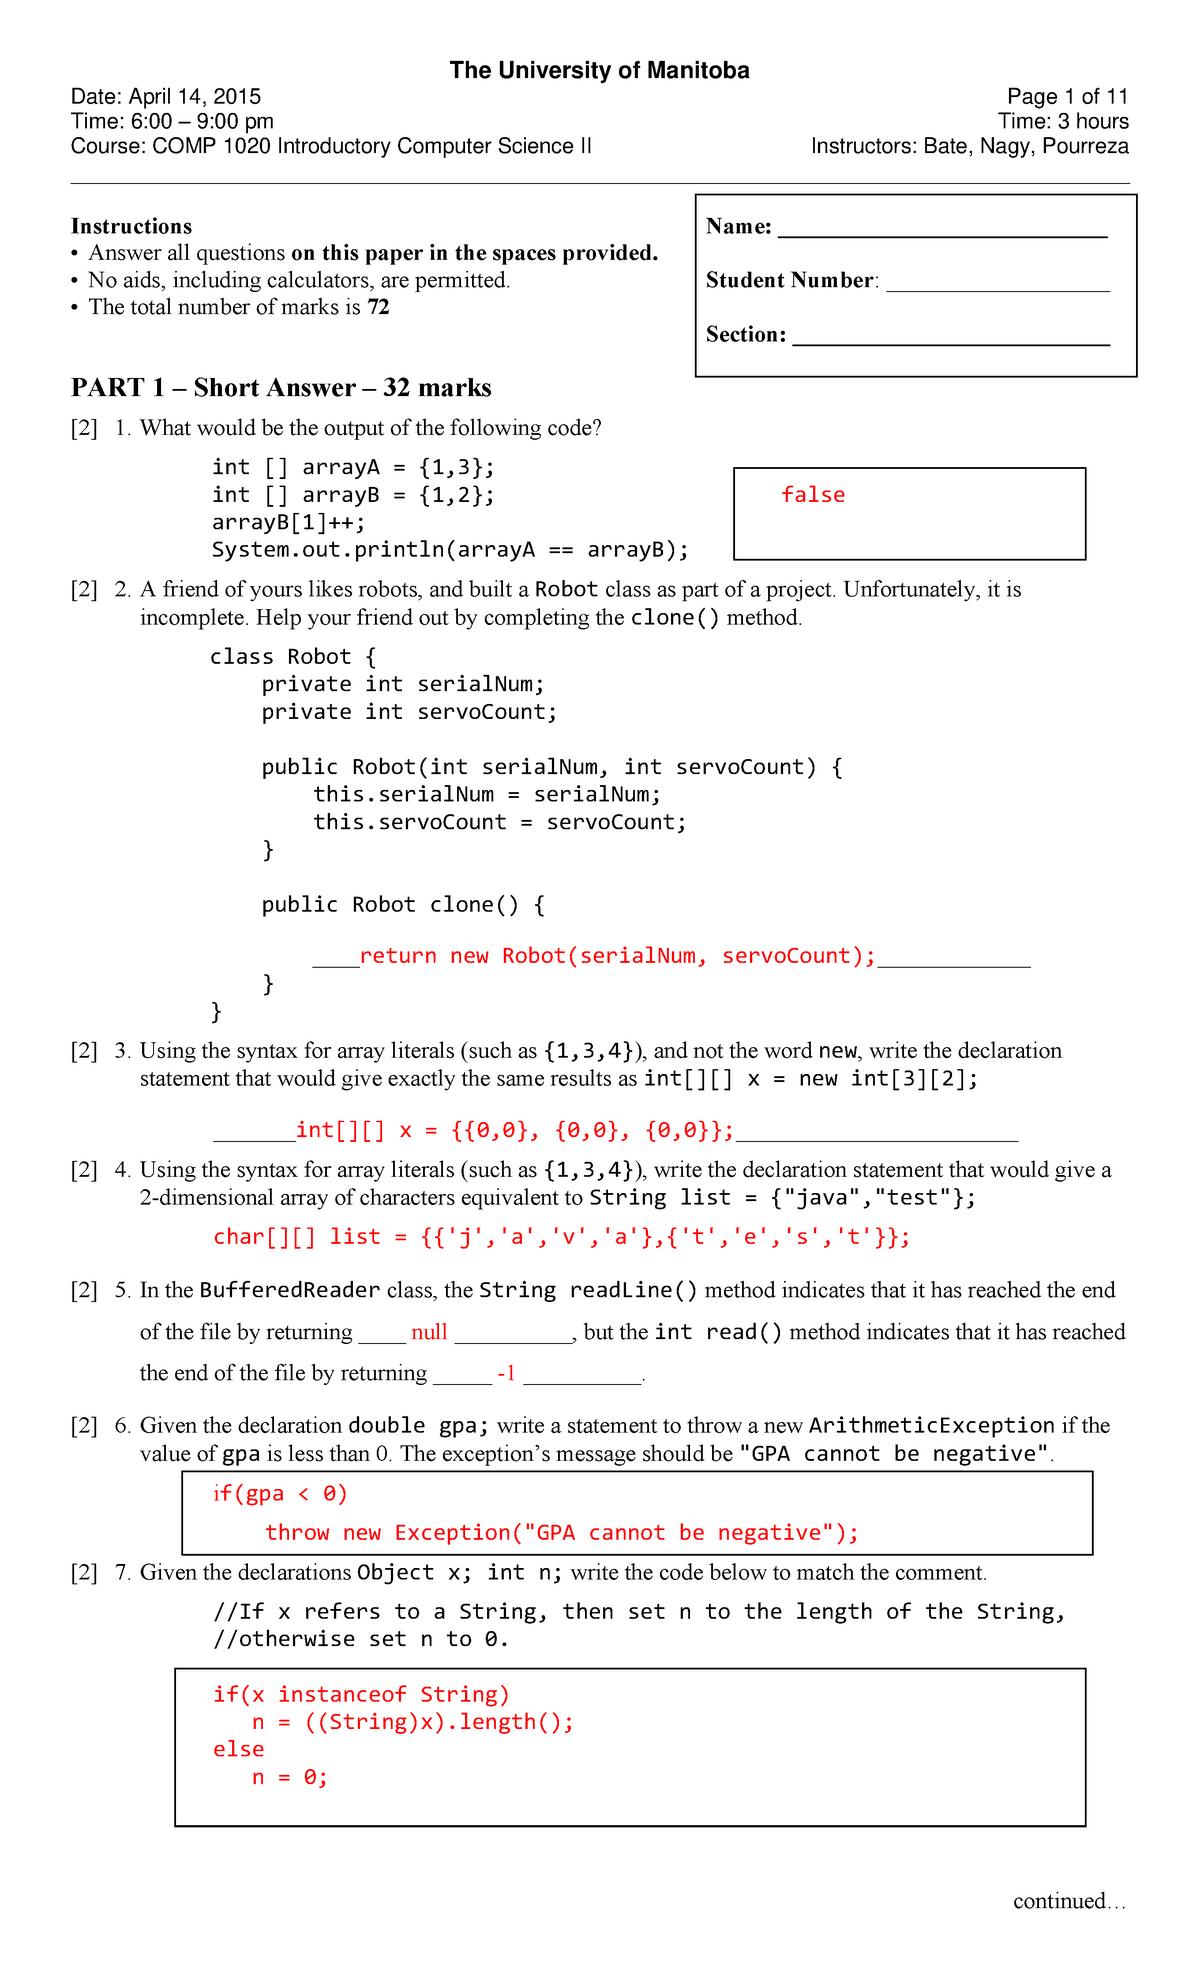 Exam 2015 - COMP 1020: Introductory Computer Science 2 - StuDocu